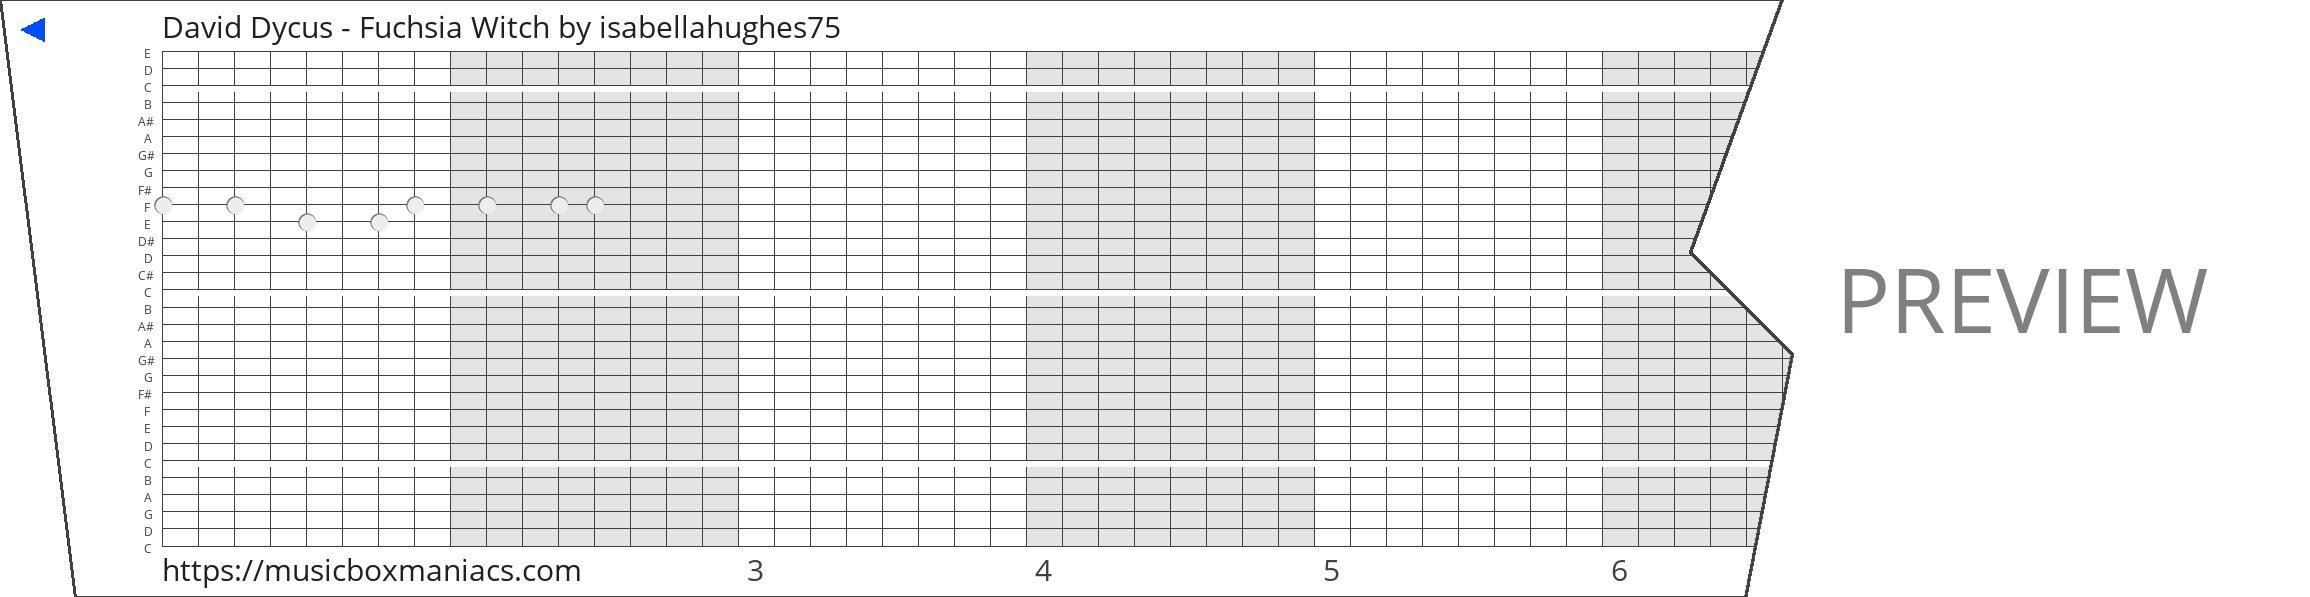 David Dycus - Fuchsia Witch 30 note music box paper strip